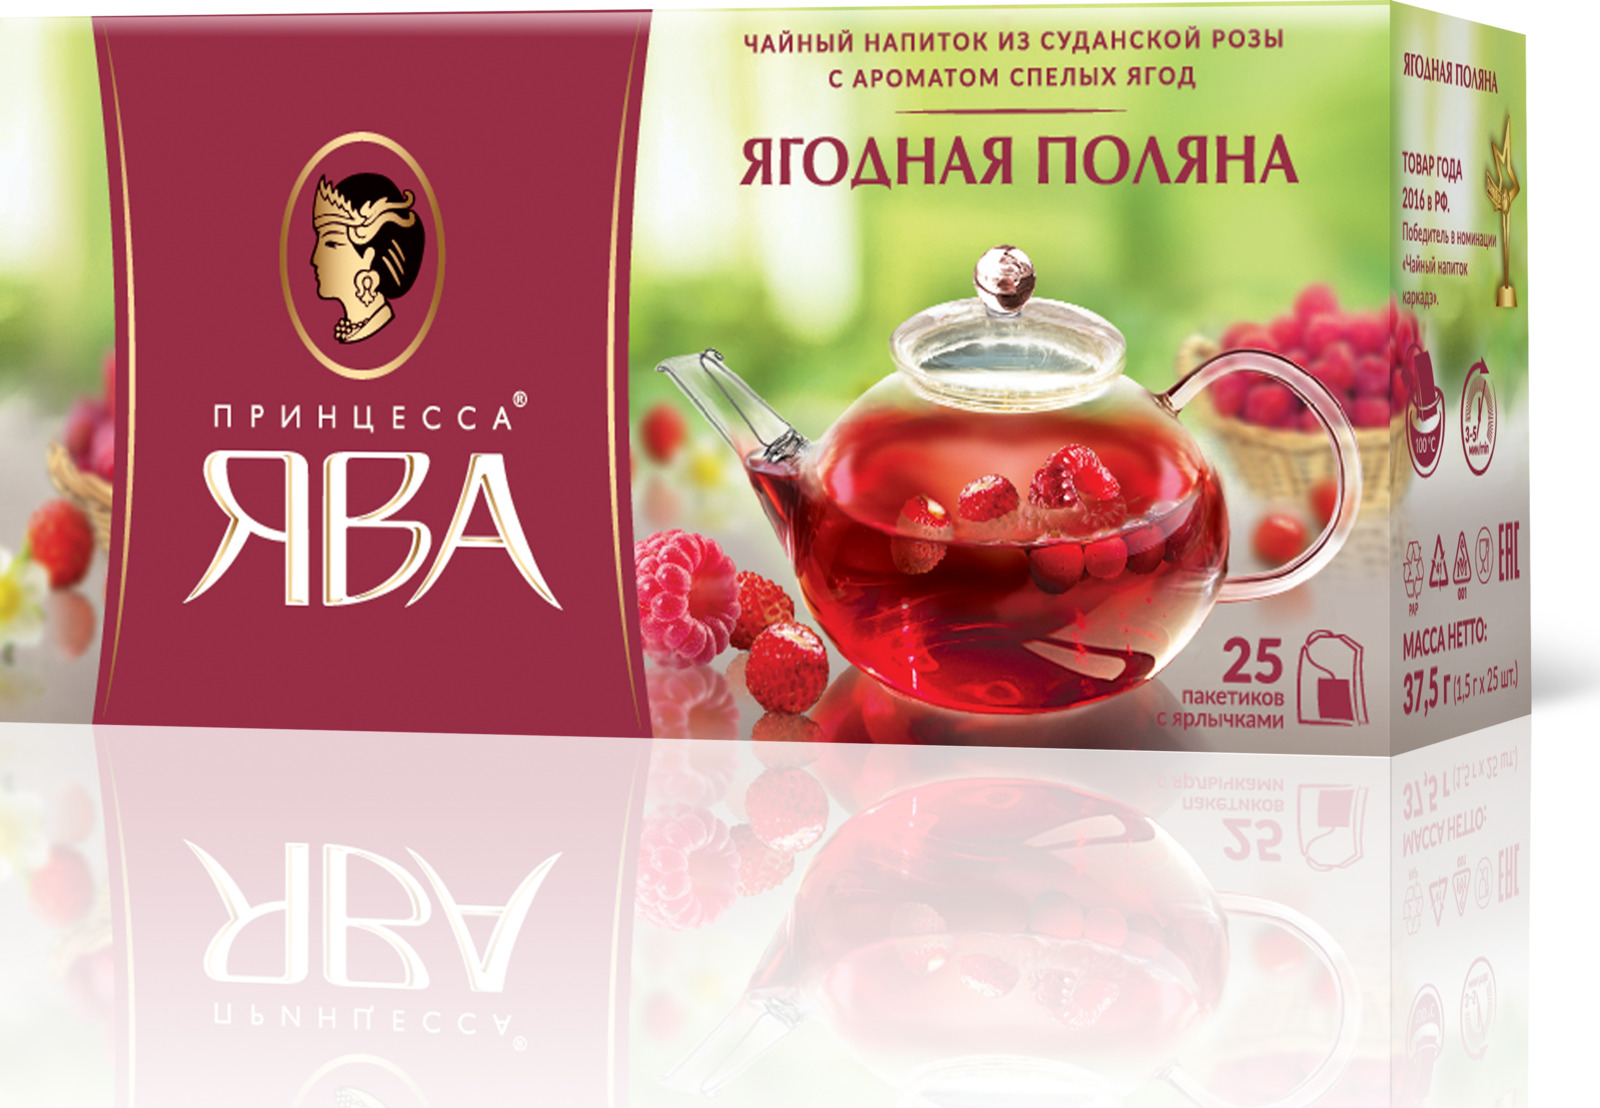 Принцесса Ява Ягодная поляна травяной чай в пакетиках, 25 шт запчасти ява харьков